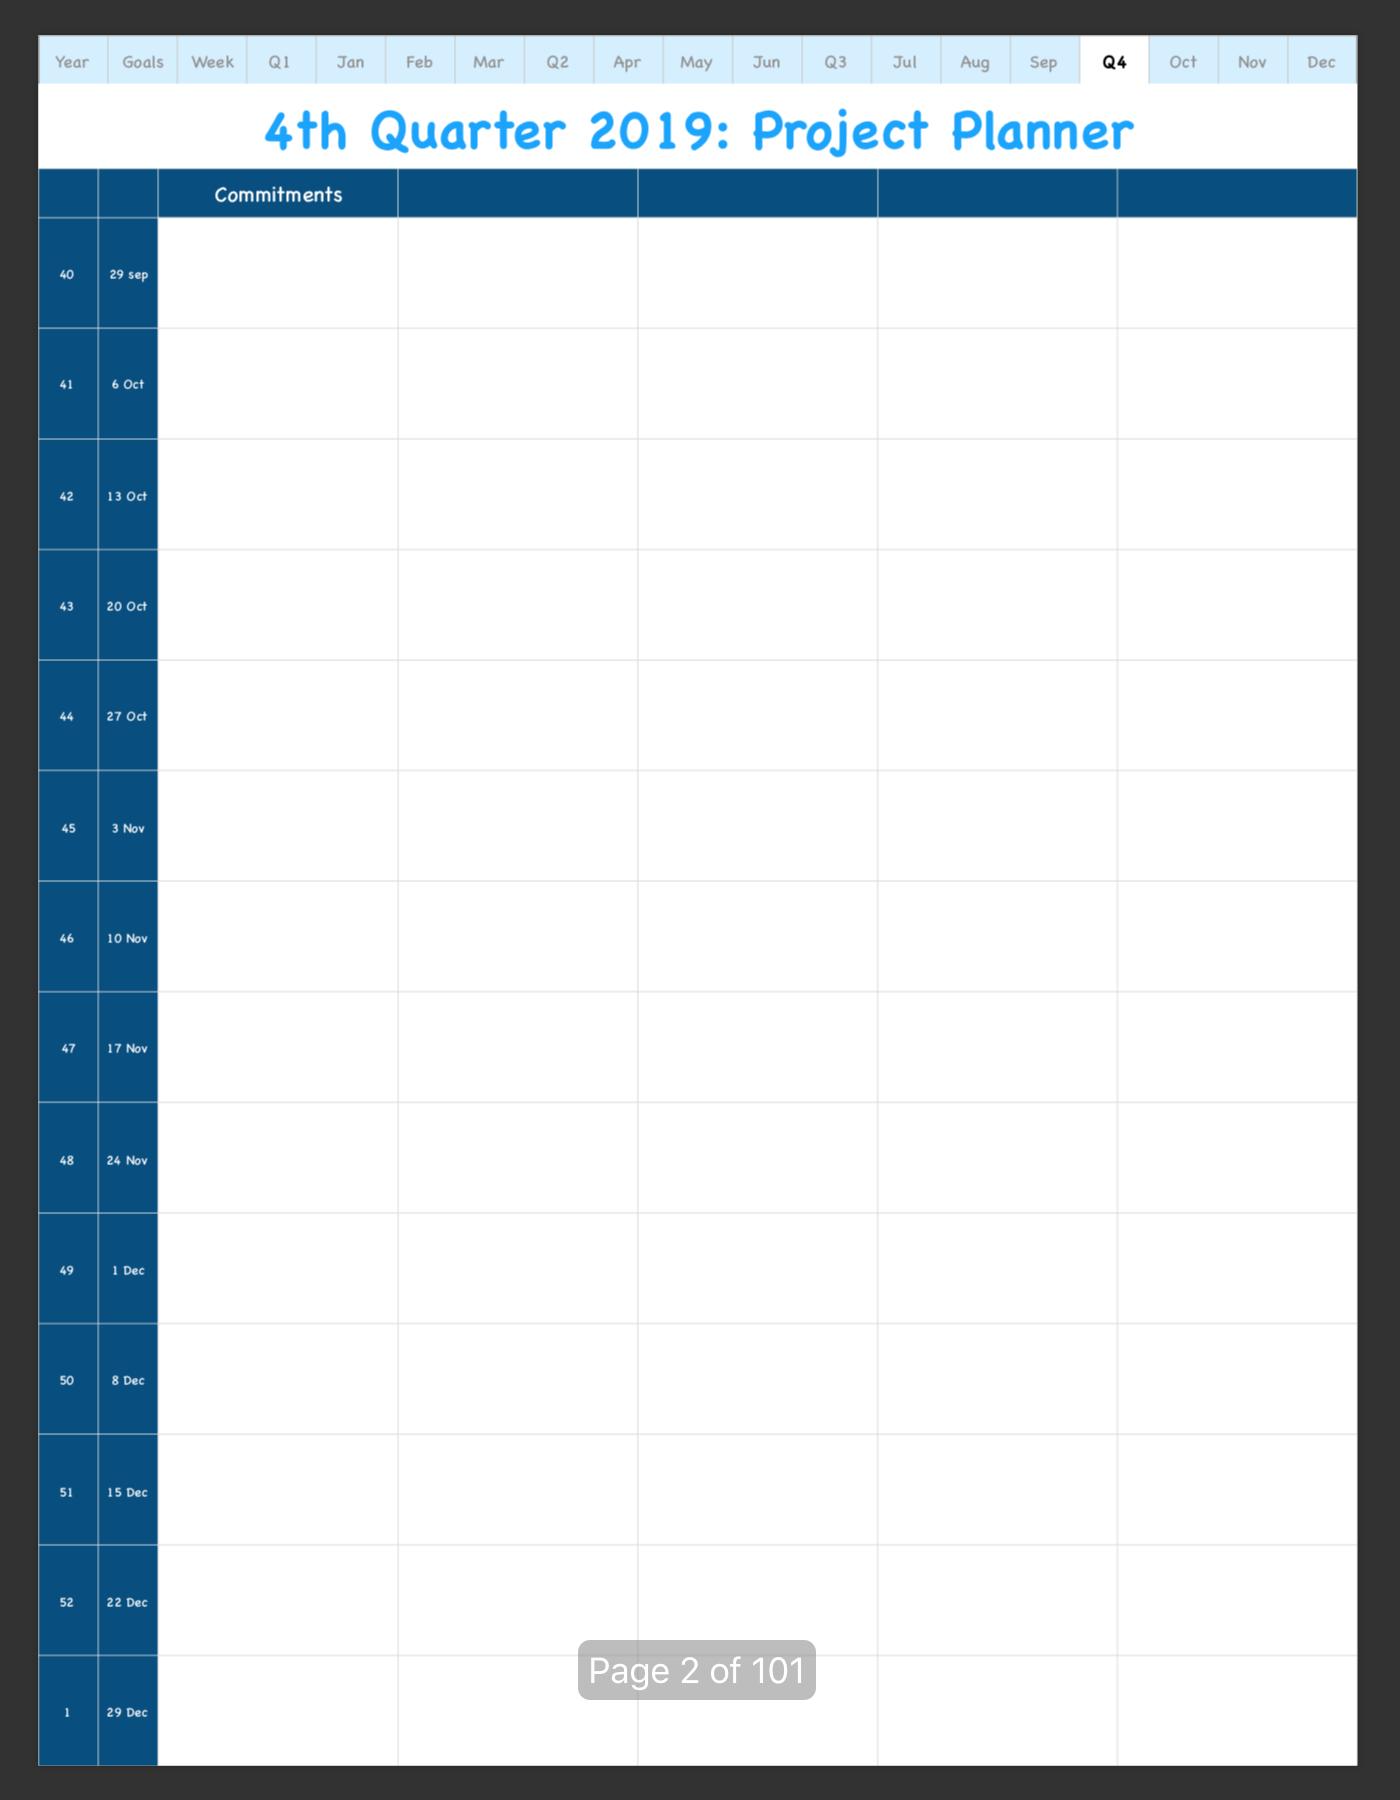 Screenshot 2019-10-01 11.35.22.png